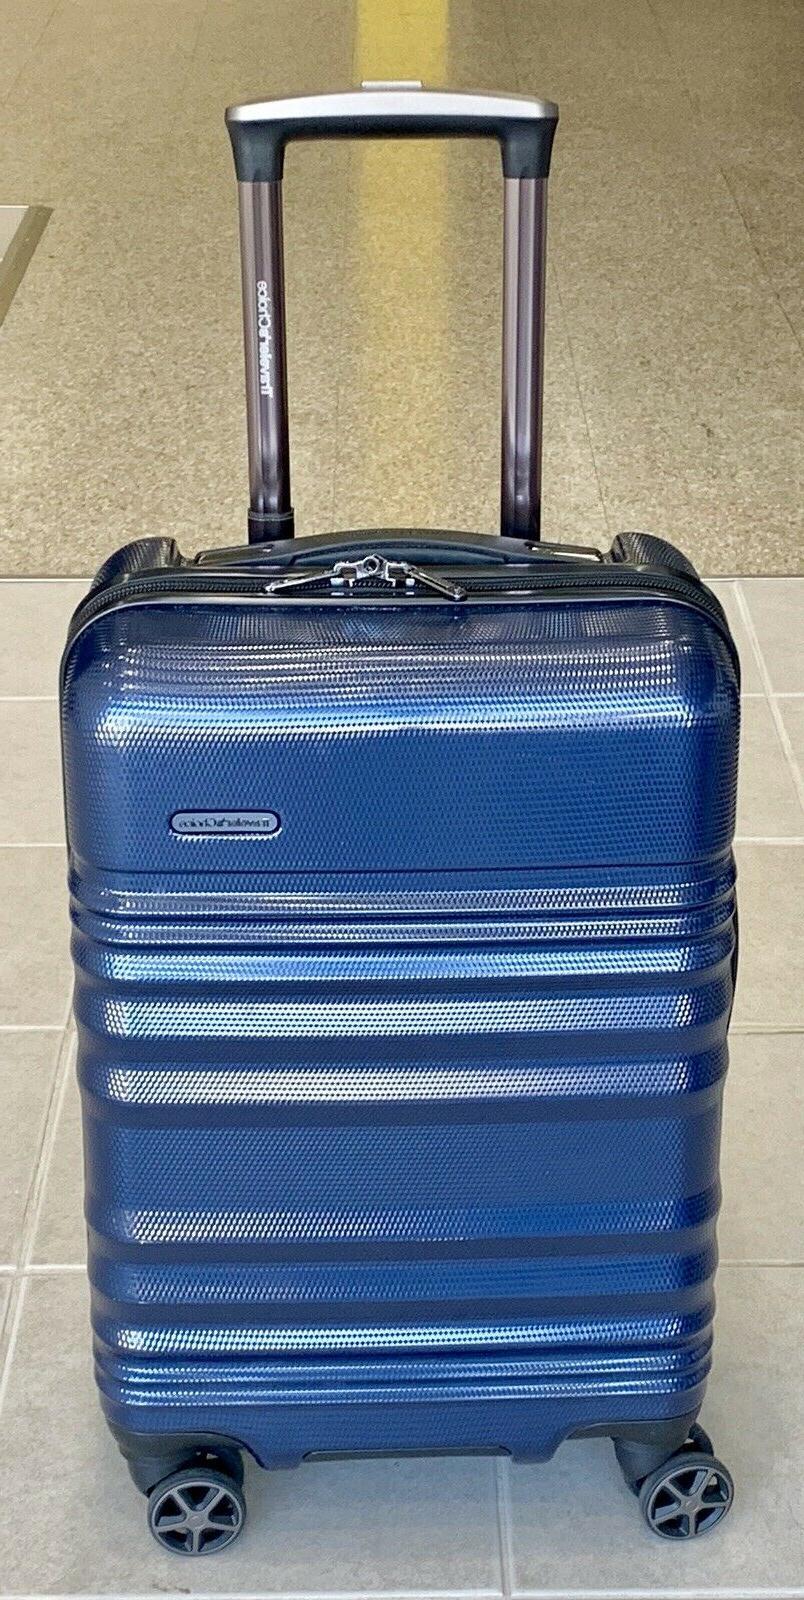 traveler s choice 21 carry on hardcase